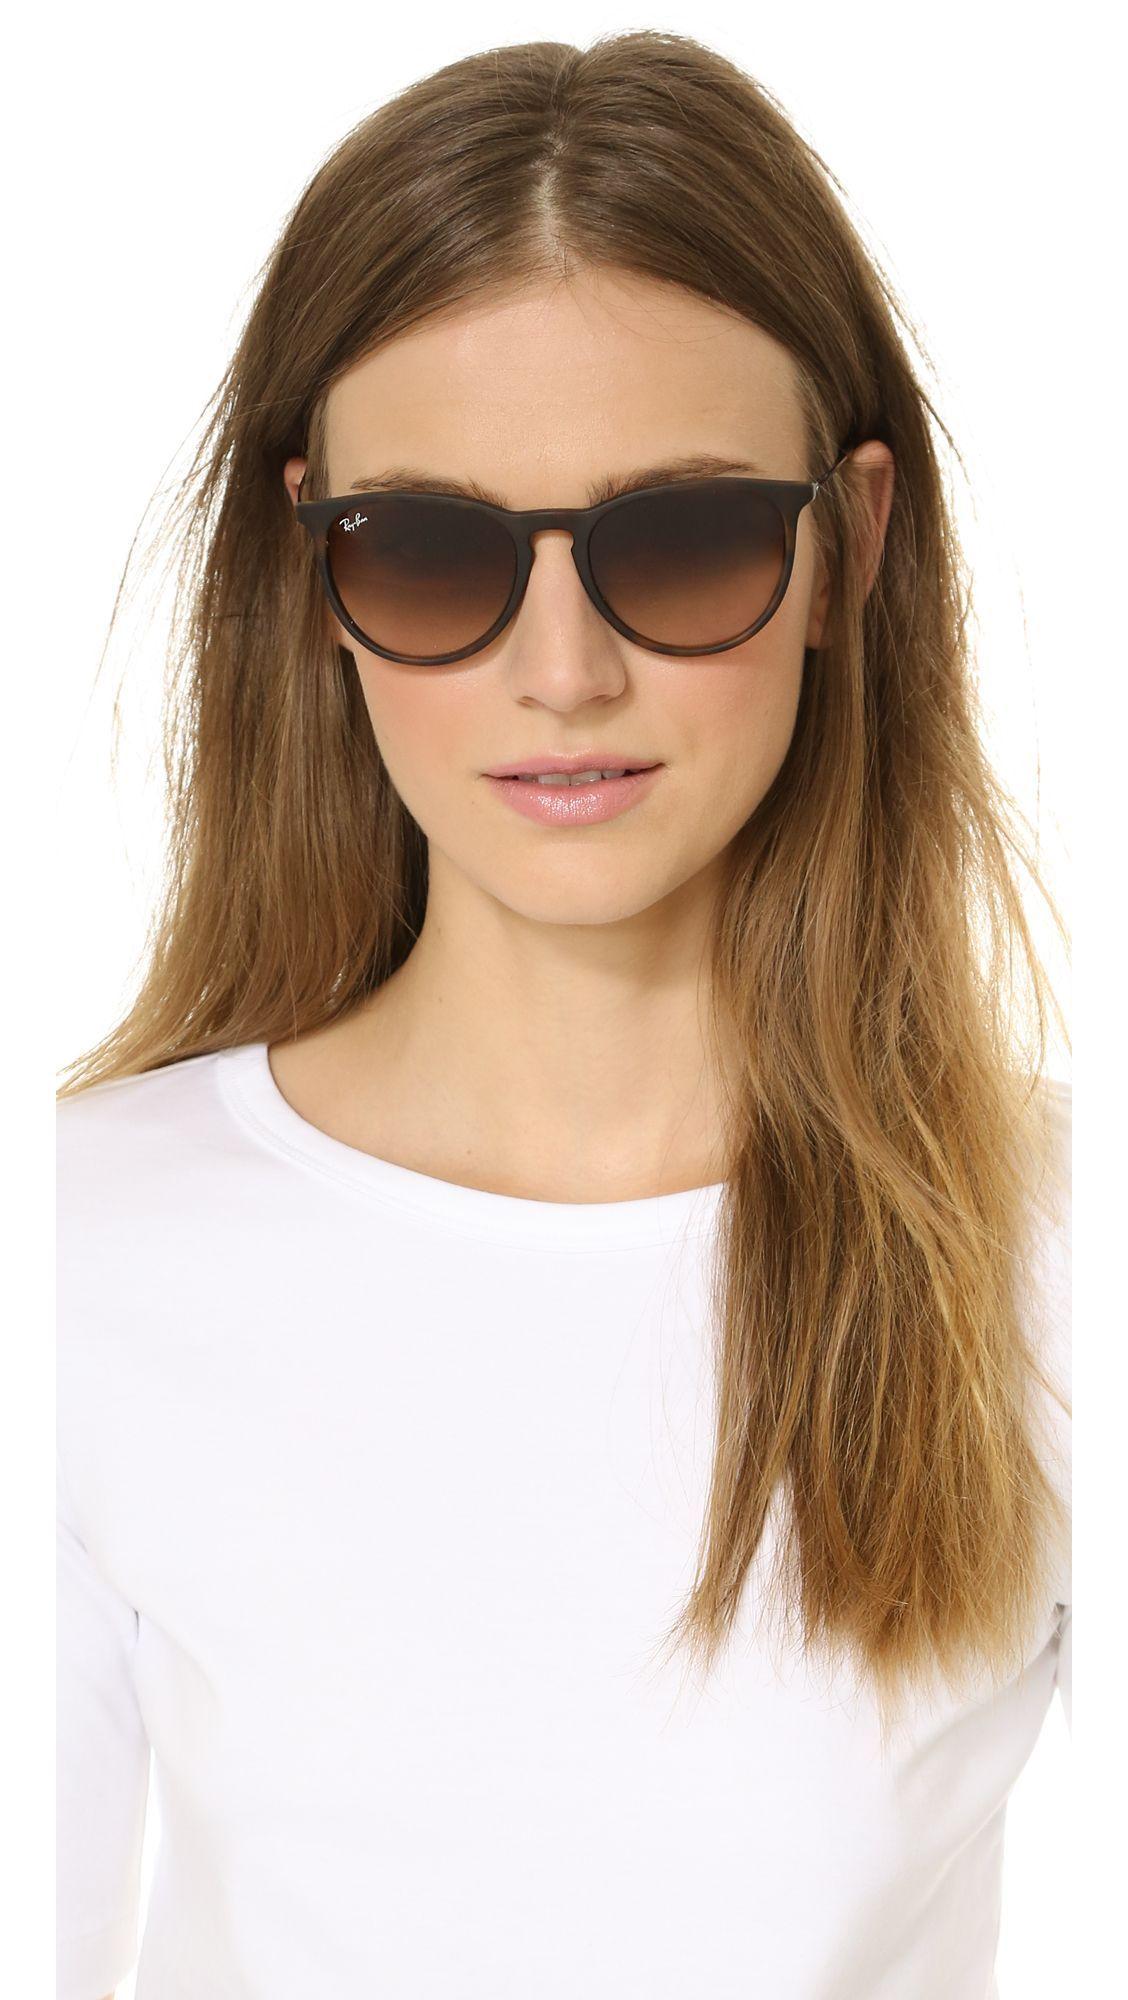 f4c55b3b4b423 Ray-Ban Erika Sunglasses 103€